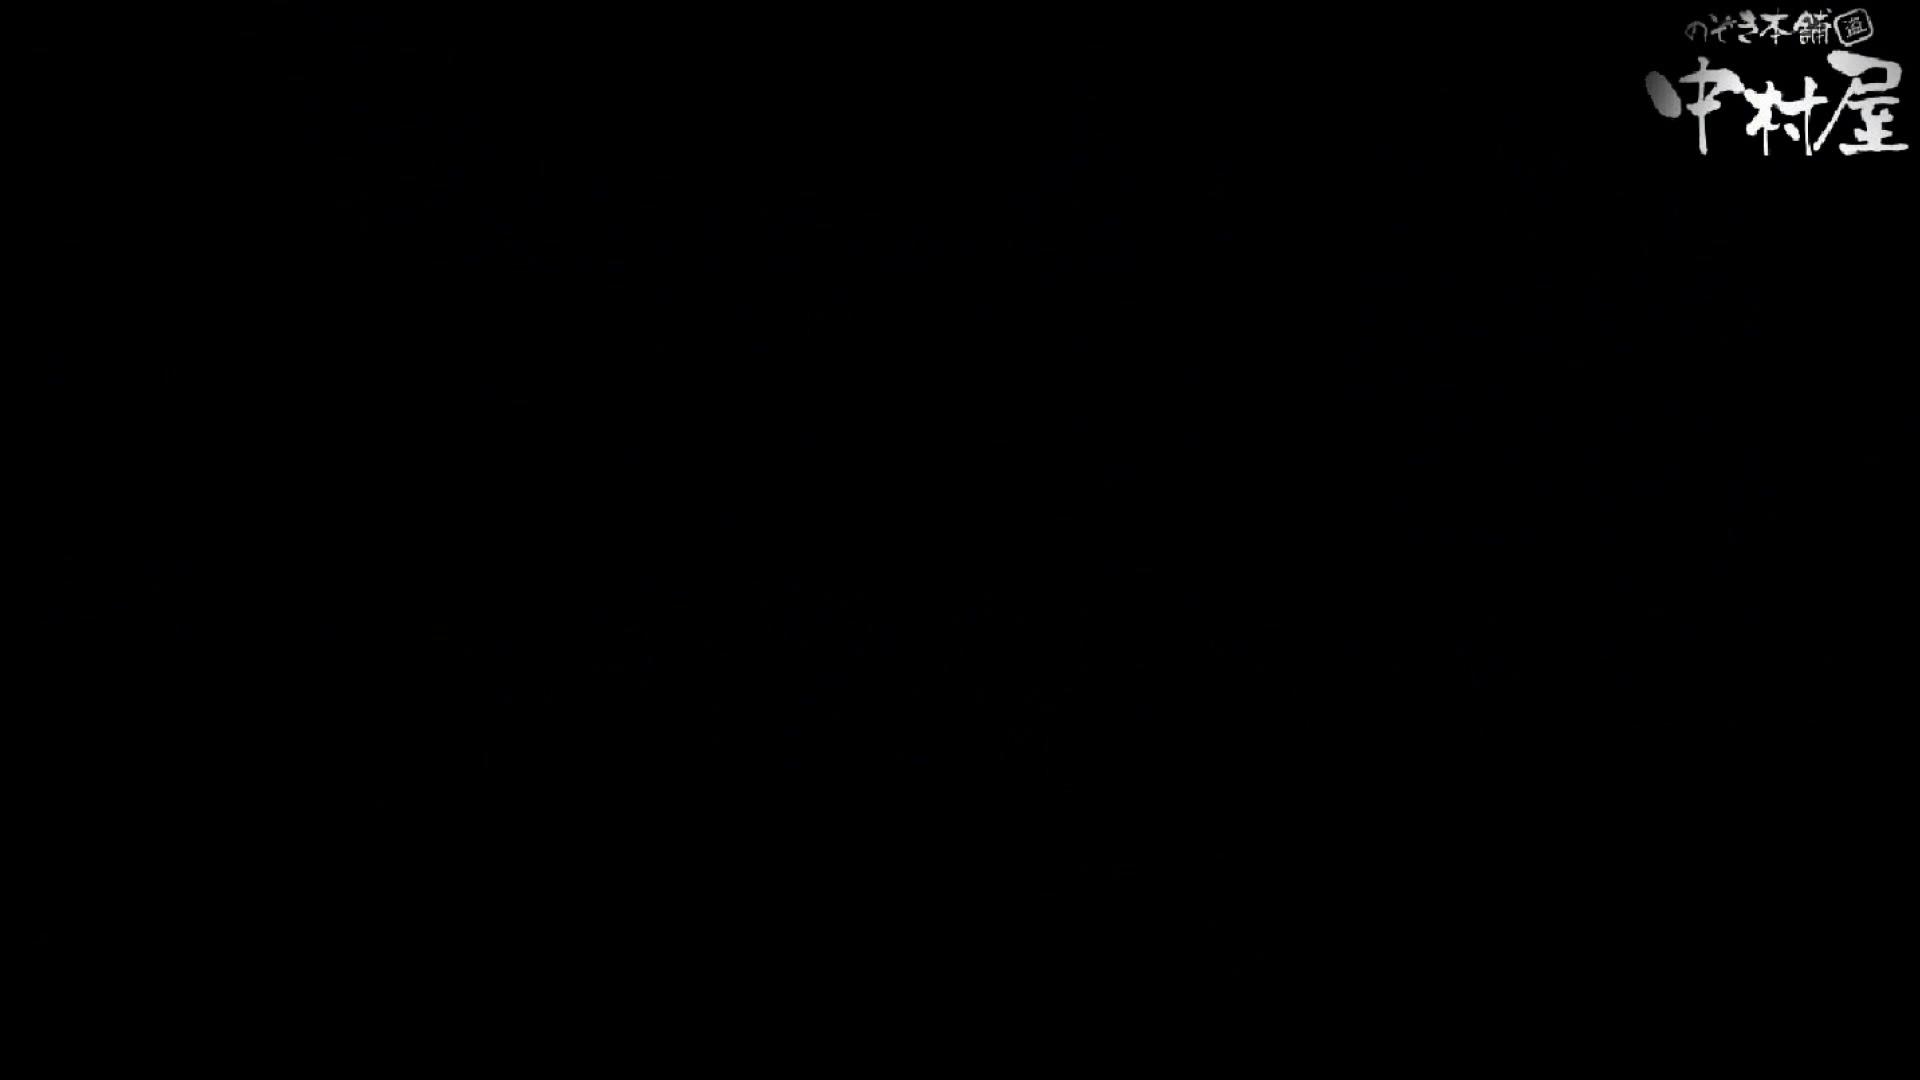 GOD HAND 芸術大学盗撮‼vol.79 OLのエロ生活 隠し撮りオマンコ動画紹介 107連発 94